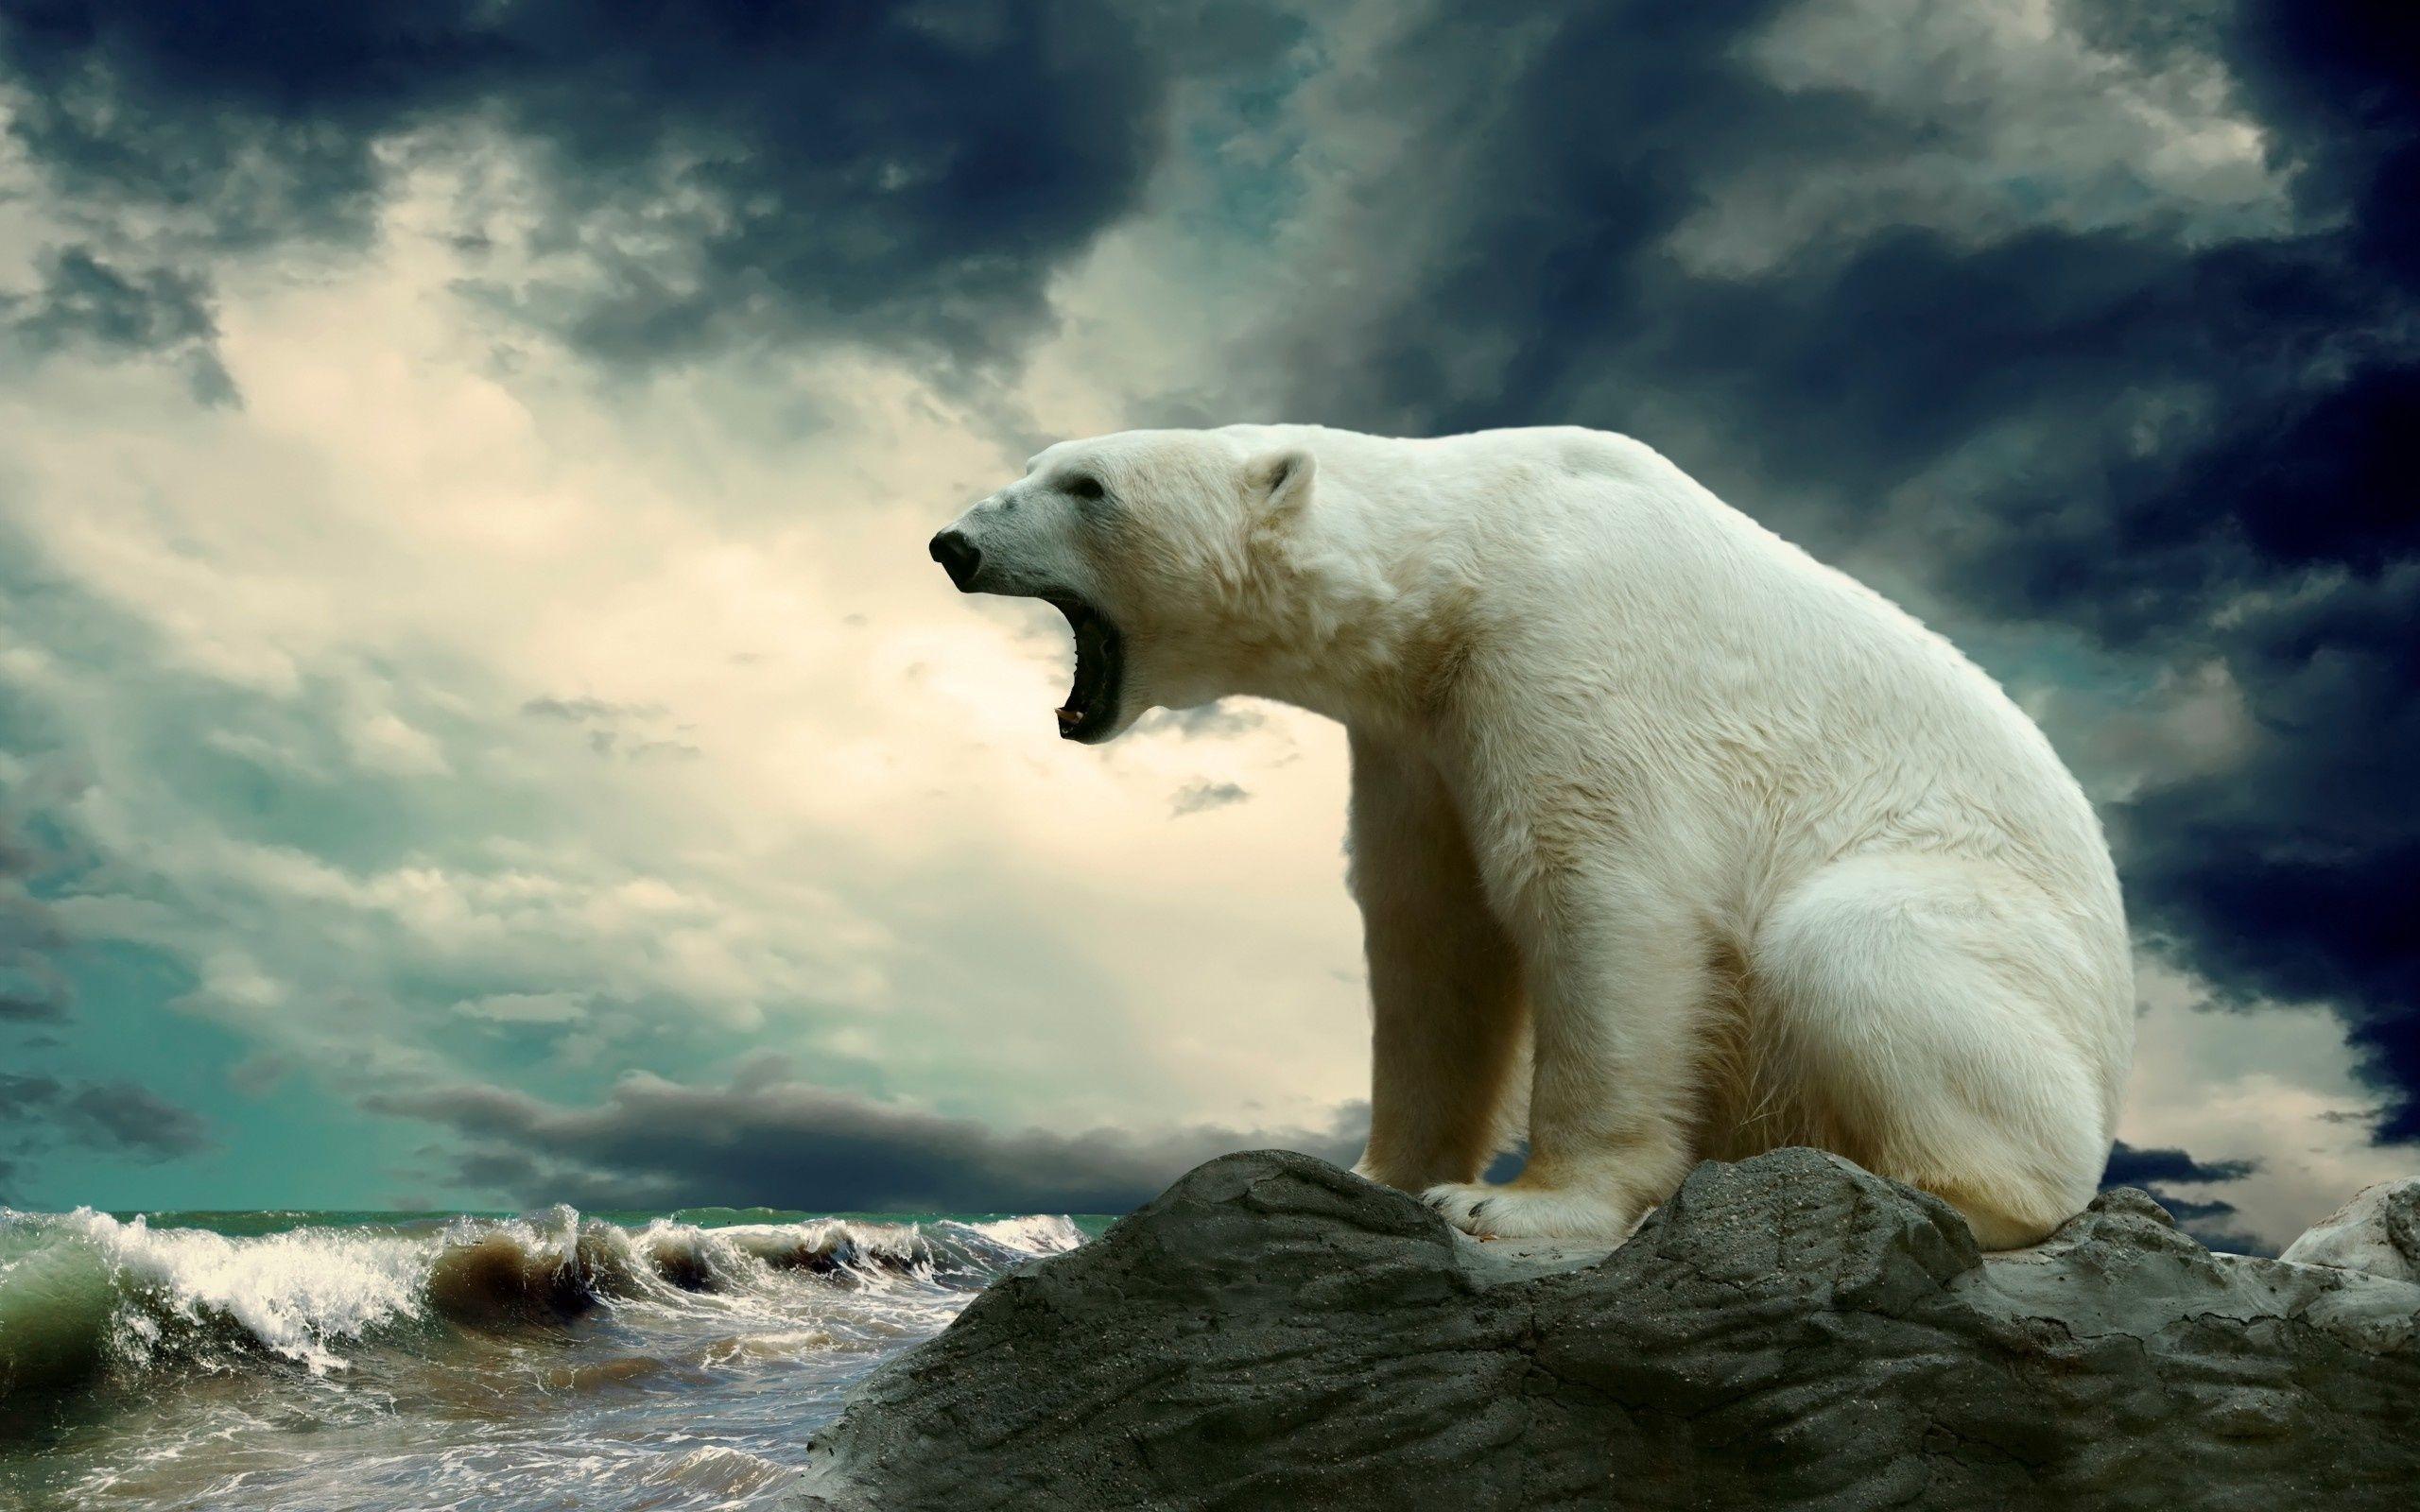 Kodiak Bear Wallpaper Bears Animals Wallpapers HD Wallpapers